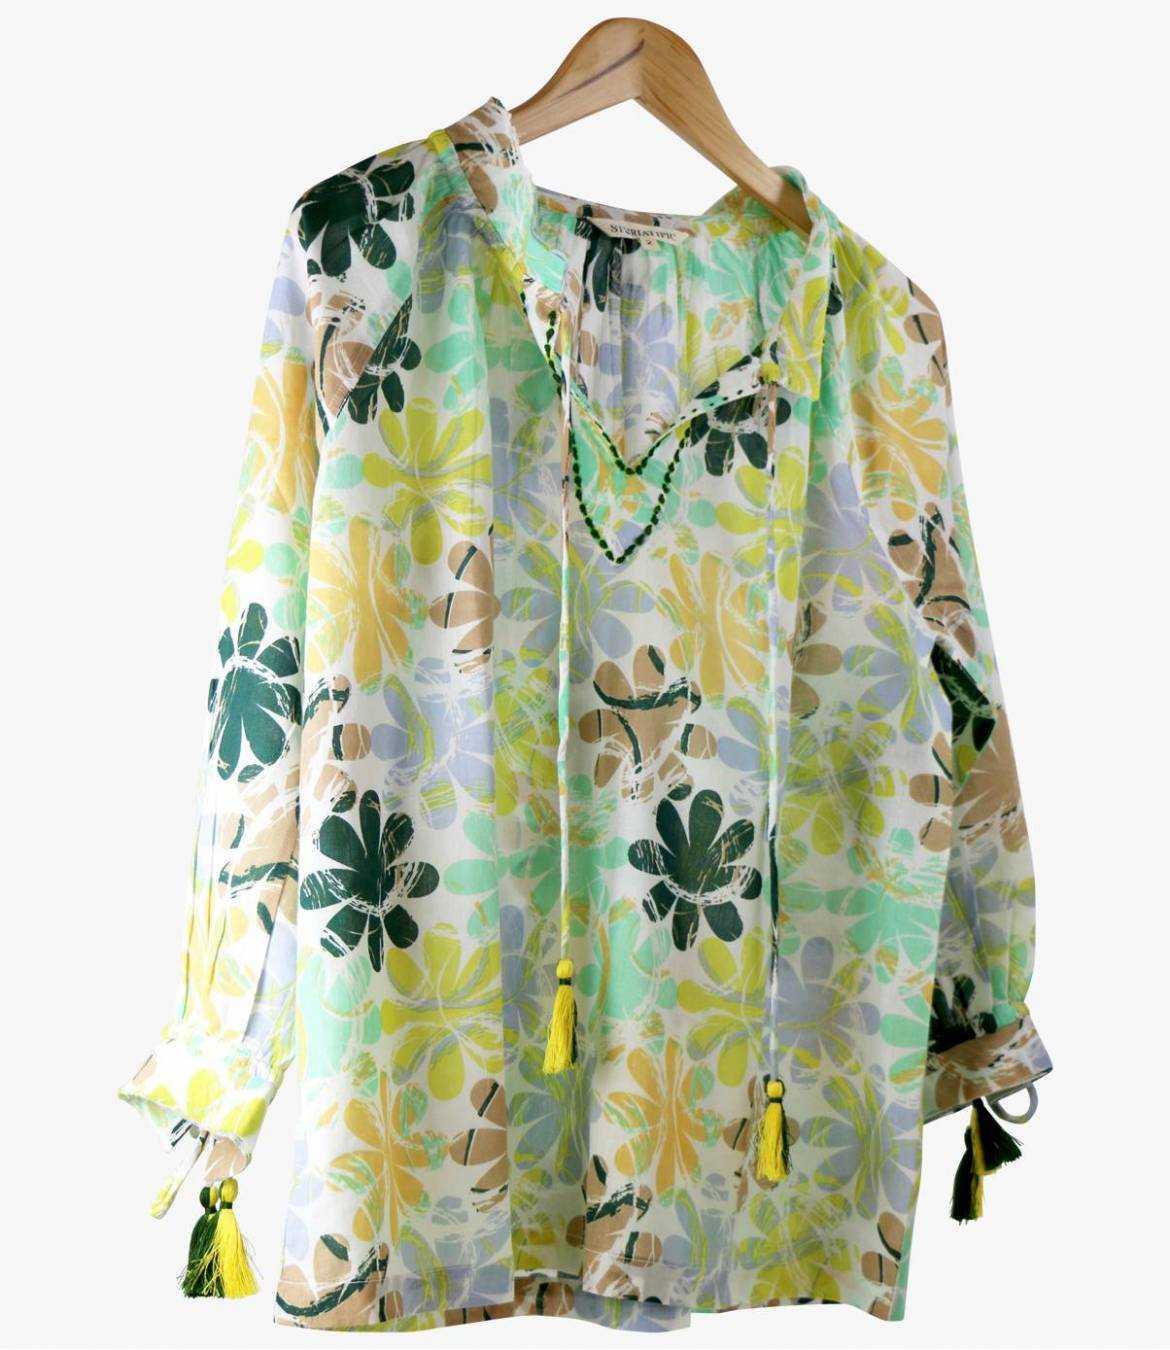 BETI ELLY Cotton Blouse for Women Storiatipic - 3